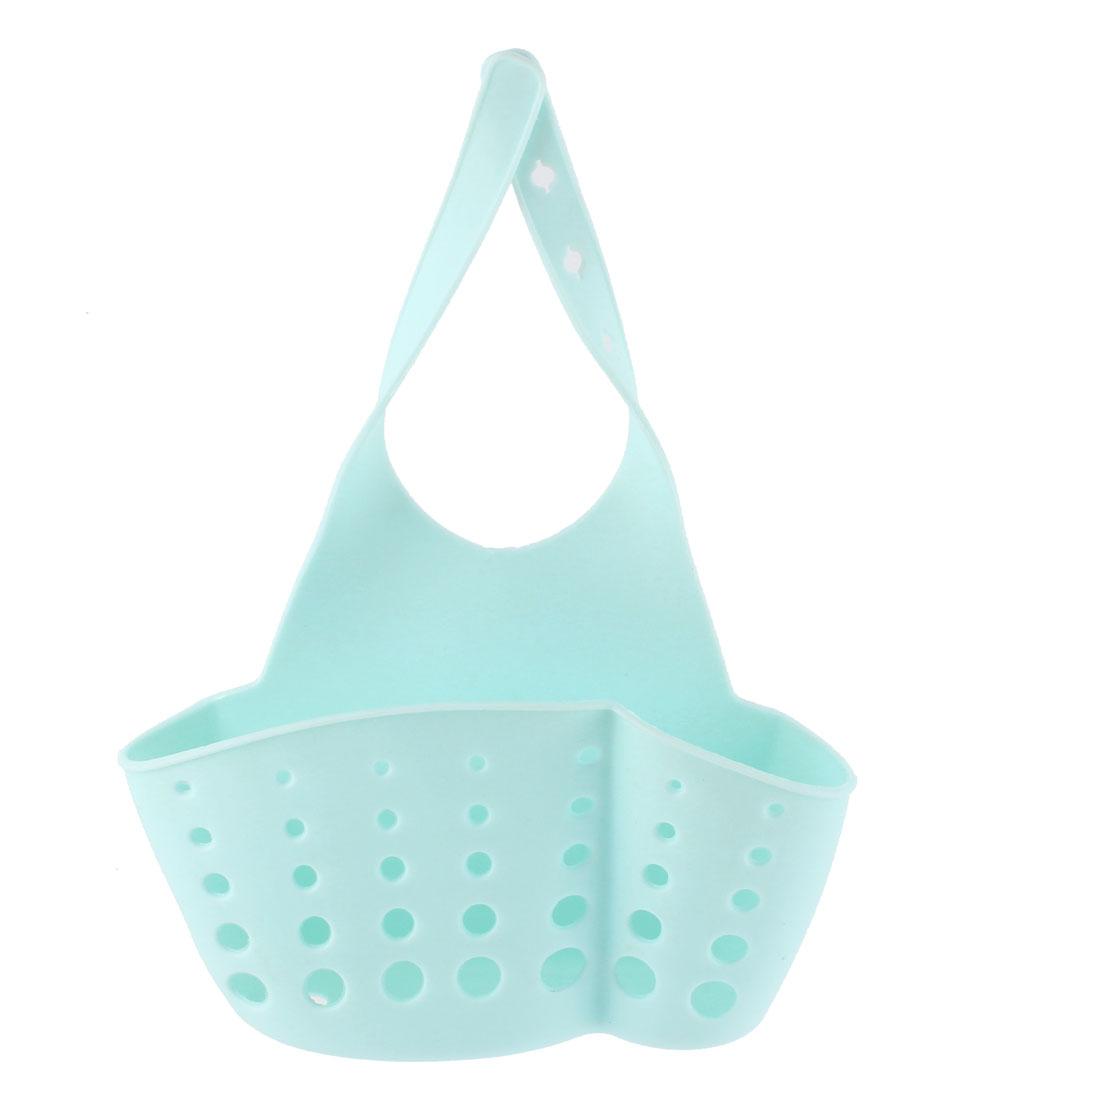 Kitchen Sink Faucet Dish Wash PVC Sponge Storage Hanger Holder Basket Aquamarine